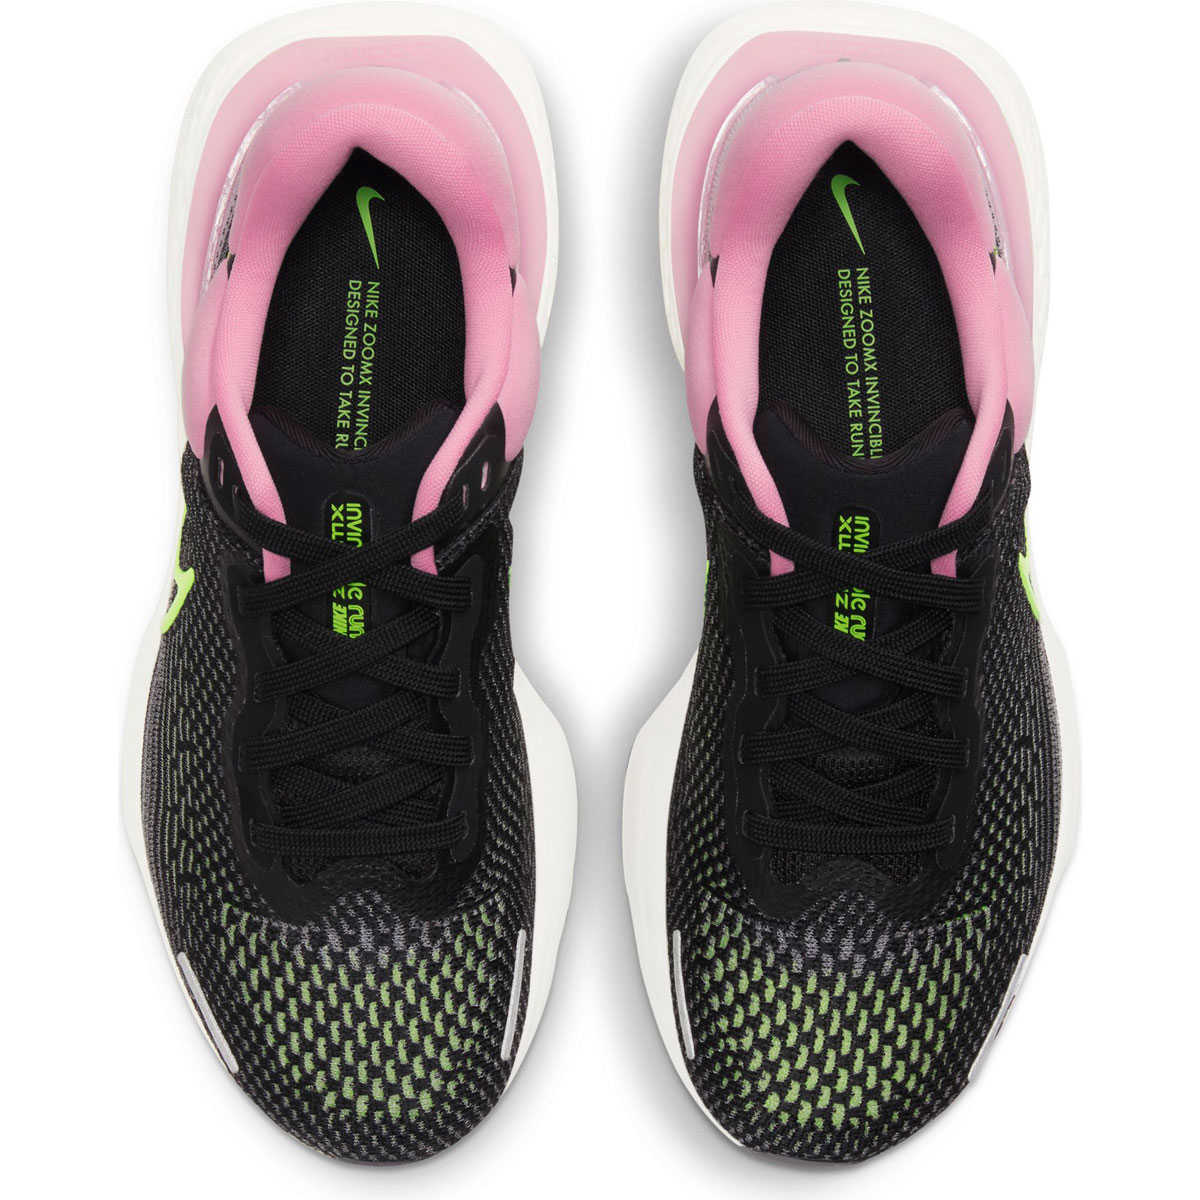 Women's Nike Zoomx Invincible Run FlyKnit Running Shoe - Color: Black/Cyber/Elemental Pink - Size: 6 - Width: Regular, Black/Cyber/Elemental Pink, large, image 3